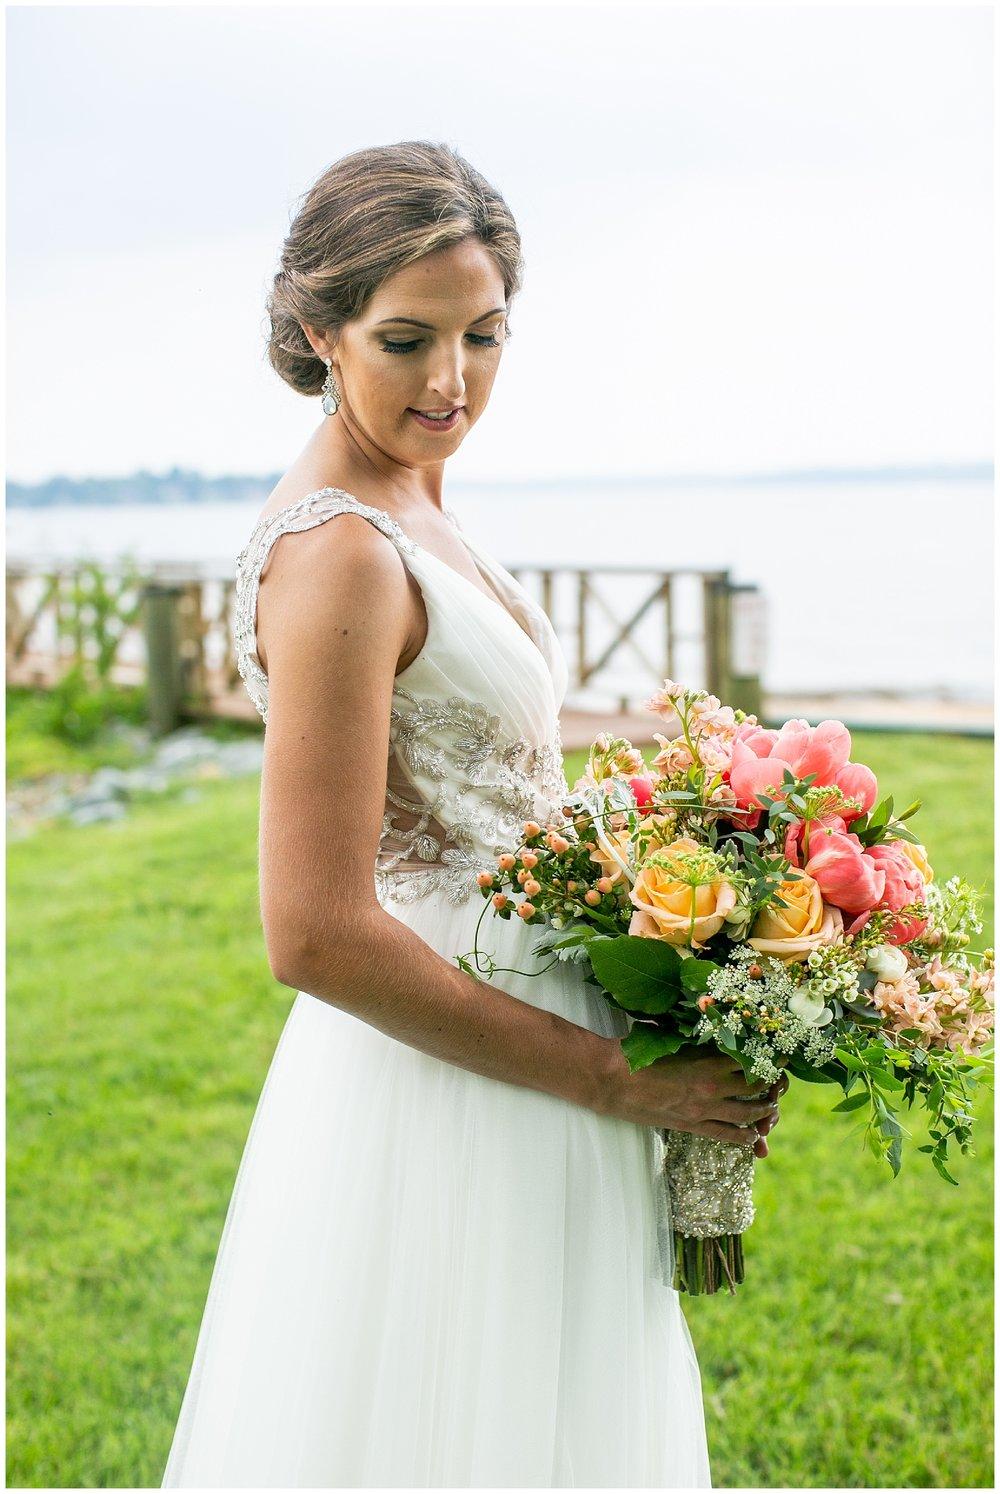 Chelsea Phil Bohemia River Overlook Wedding Living Radiant Photography photos_0050.jpg